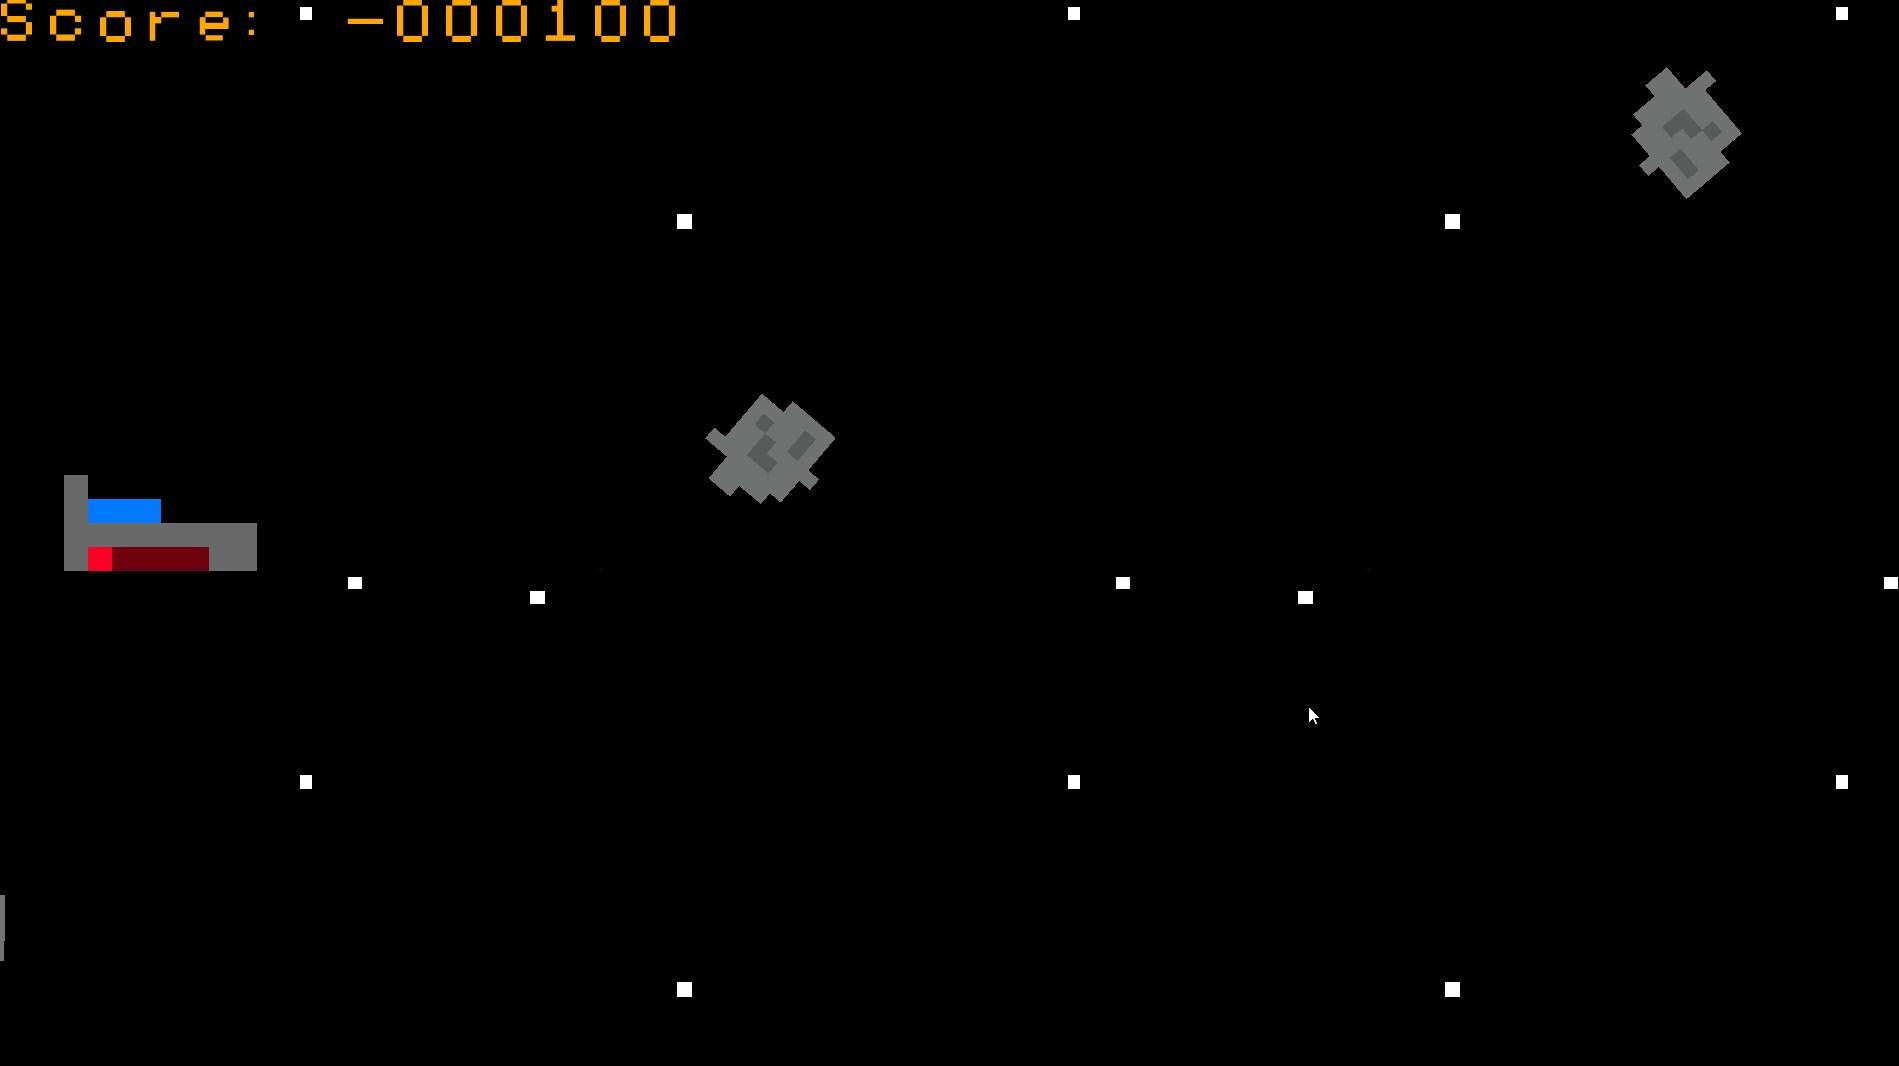 Injured by space screenshot